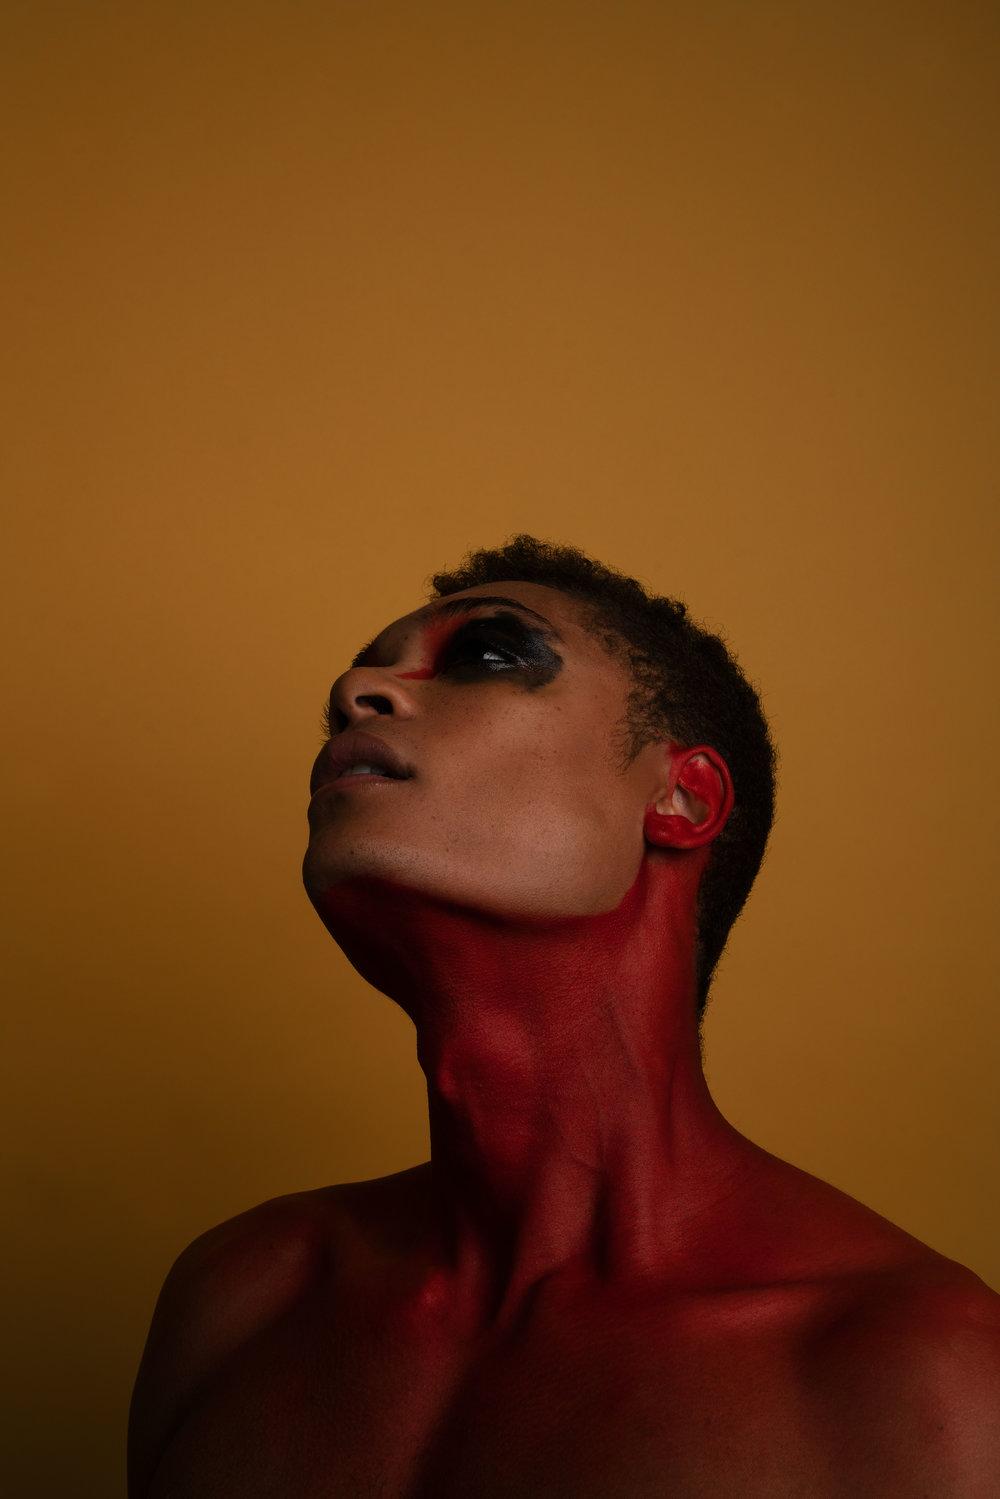 aaron abstract editorial orange backdrop shot by robert ravenscroft nyc